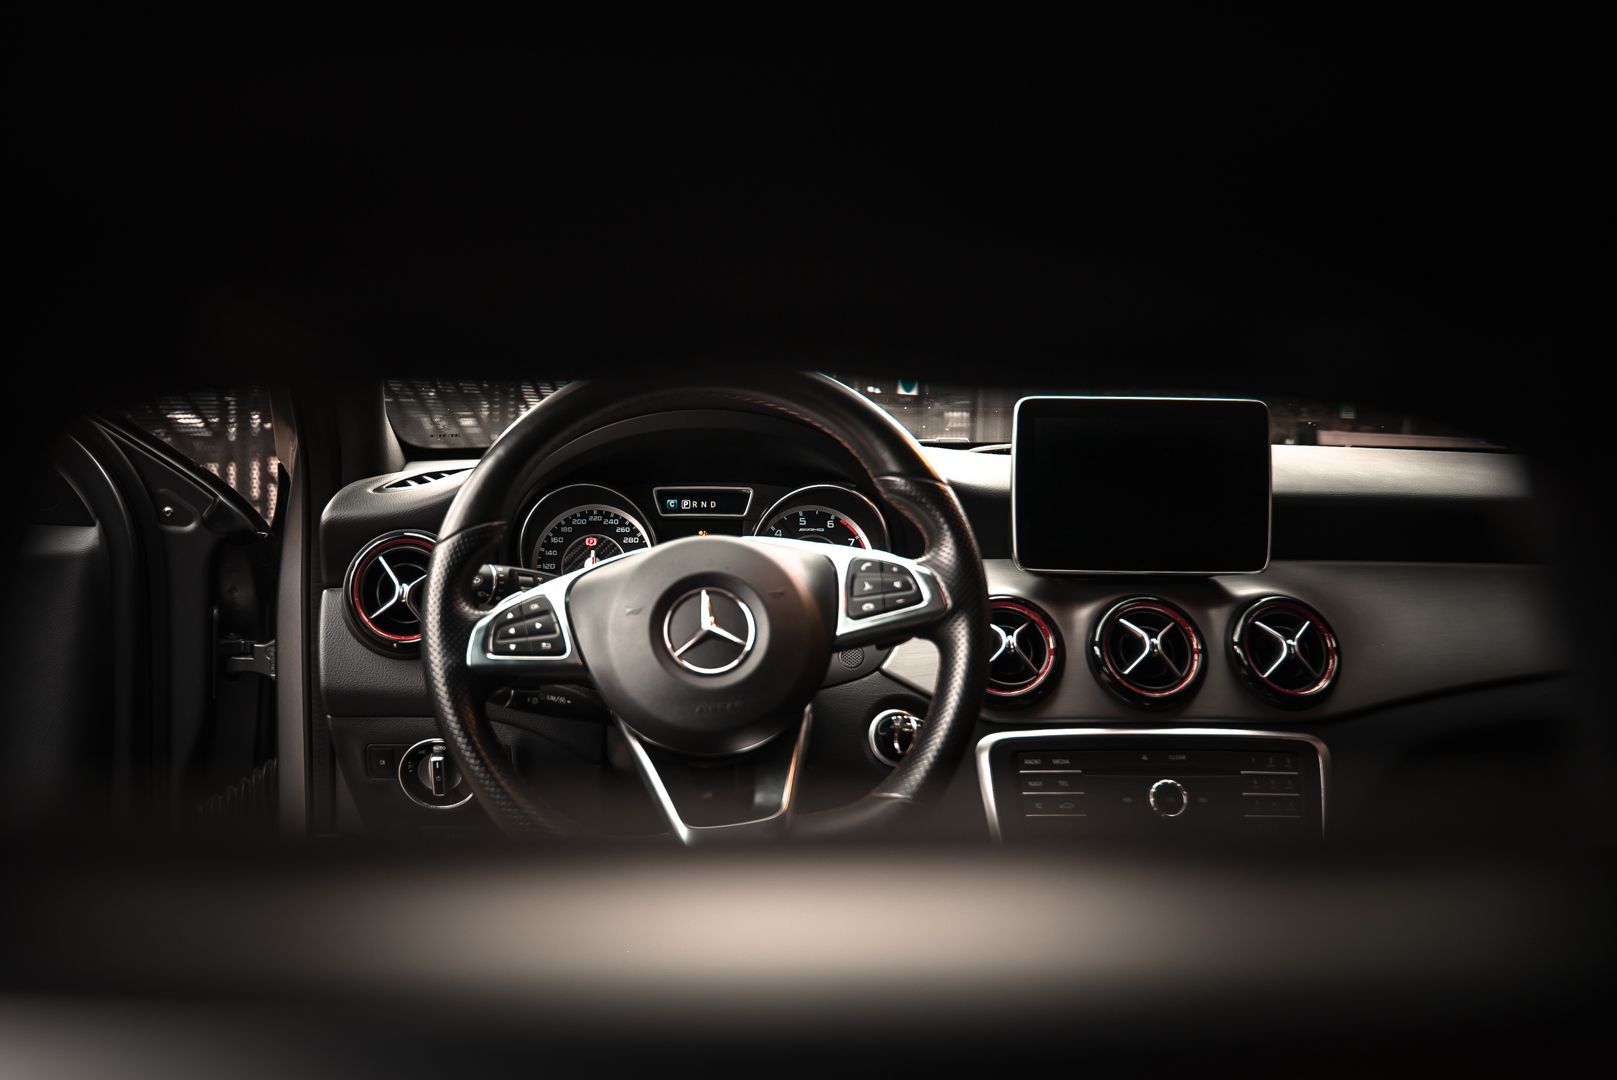 2015 Mercedes-Benz GLA AMG 45 68311